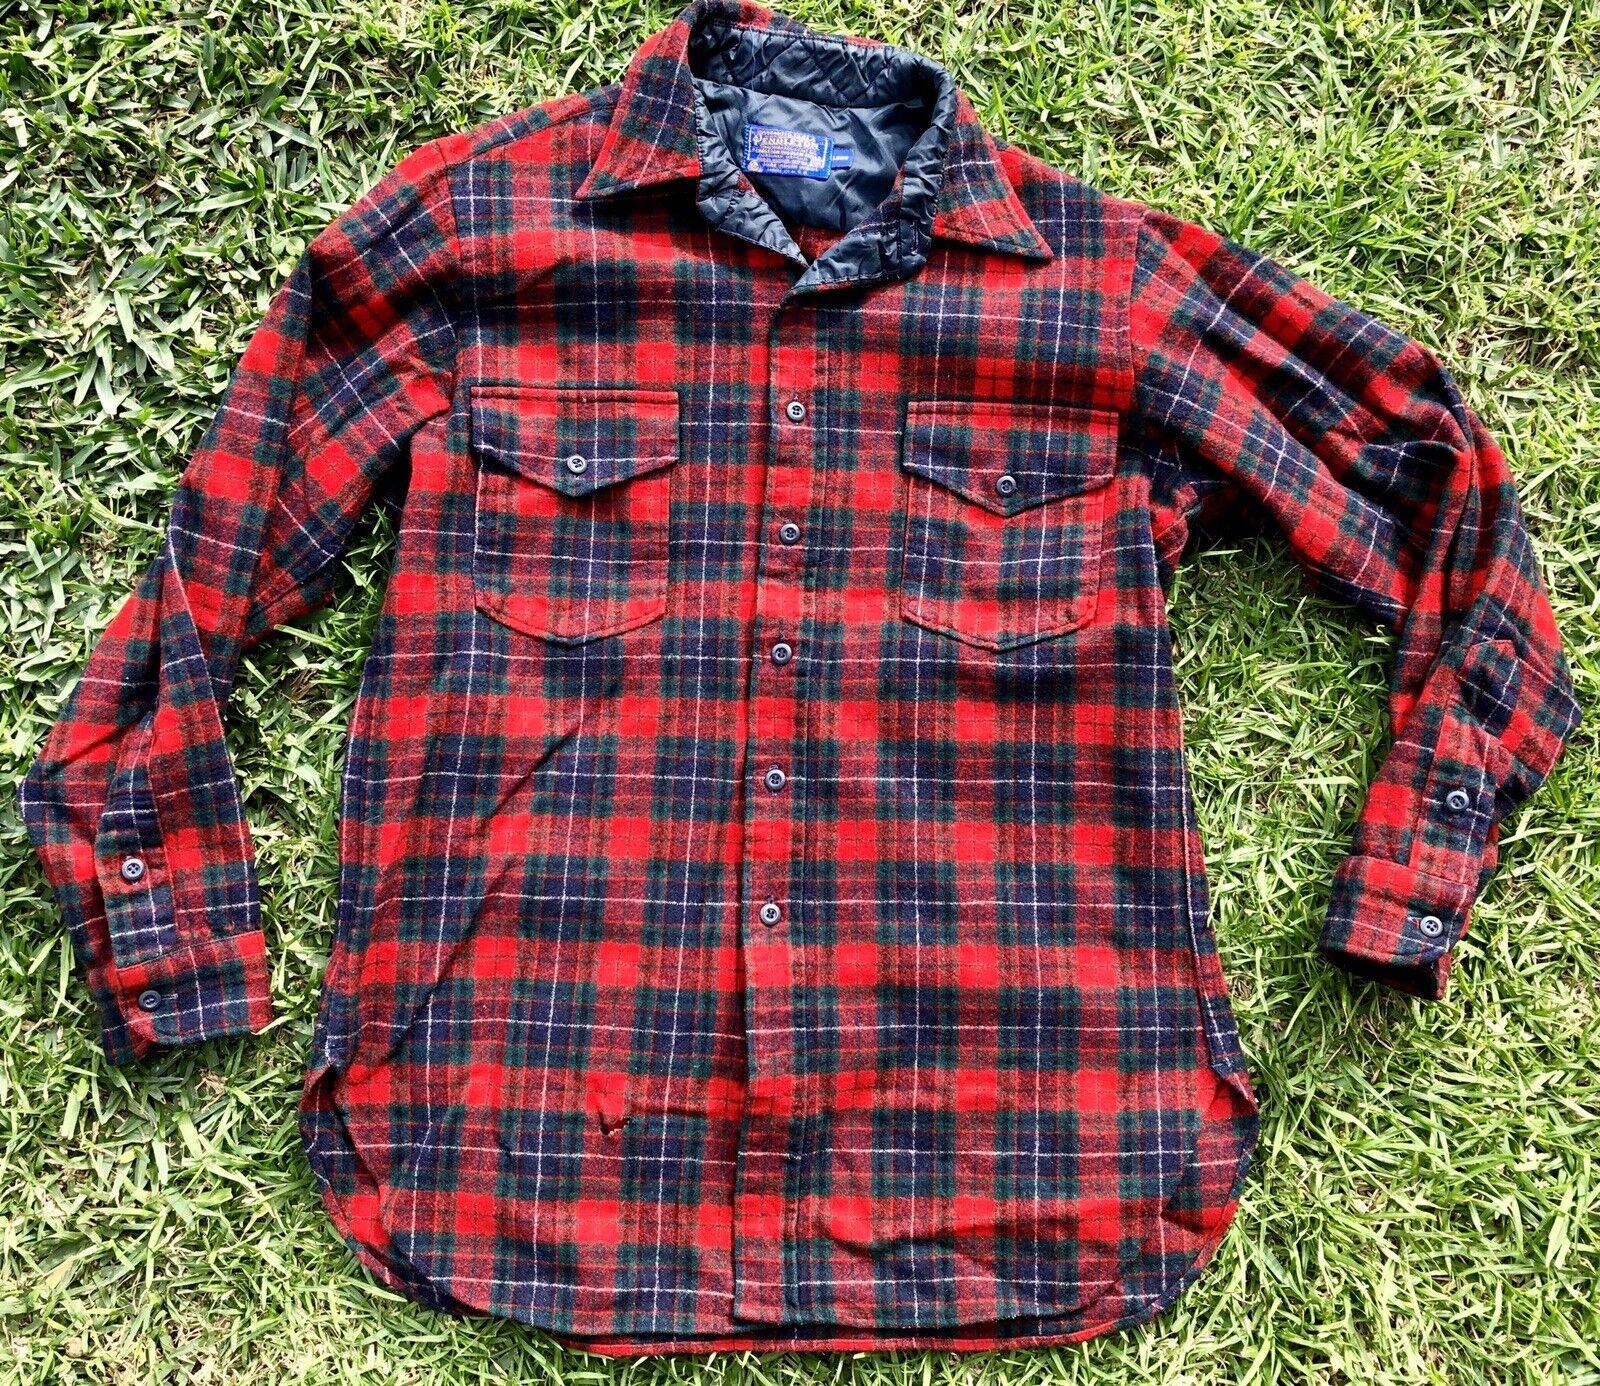 130bf85f067 Vintage Pendleton 100% Virgin Wool Long Sleeve Mens Sz 16 1 2 Made In USA. HUGO  BOSS MEN S SKY blueE SHORT SLEEVE POLO RUGBY SHIRT SIZE M 6198